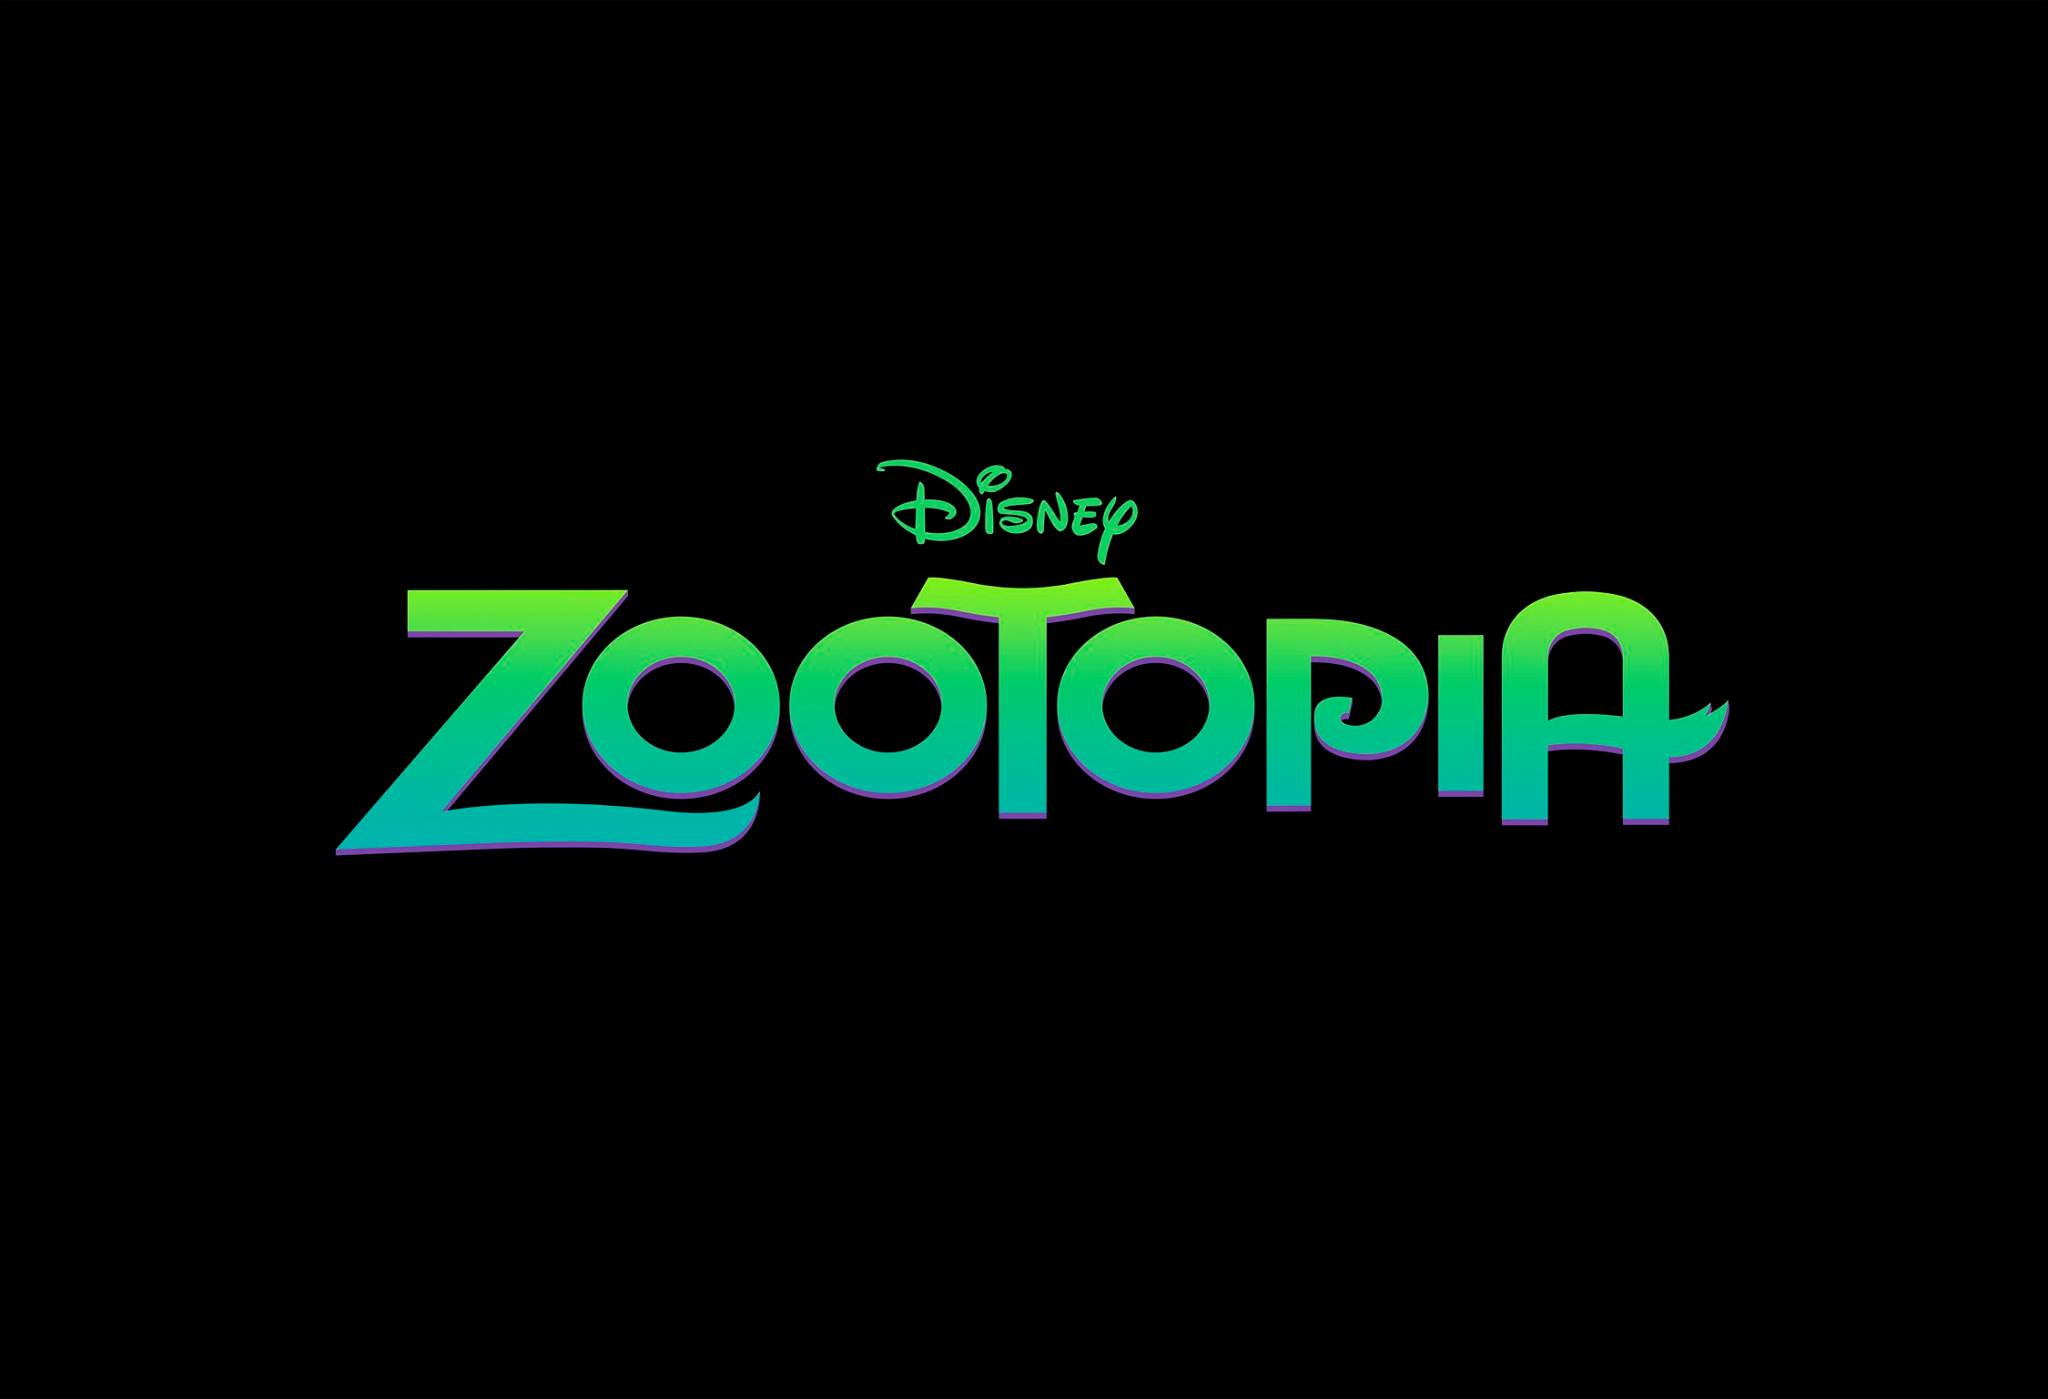 meet the characters of zootopia geekynews